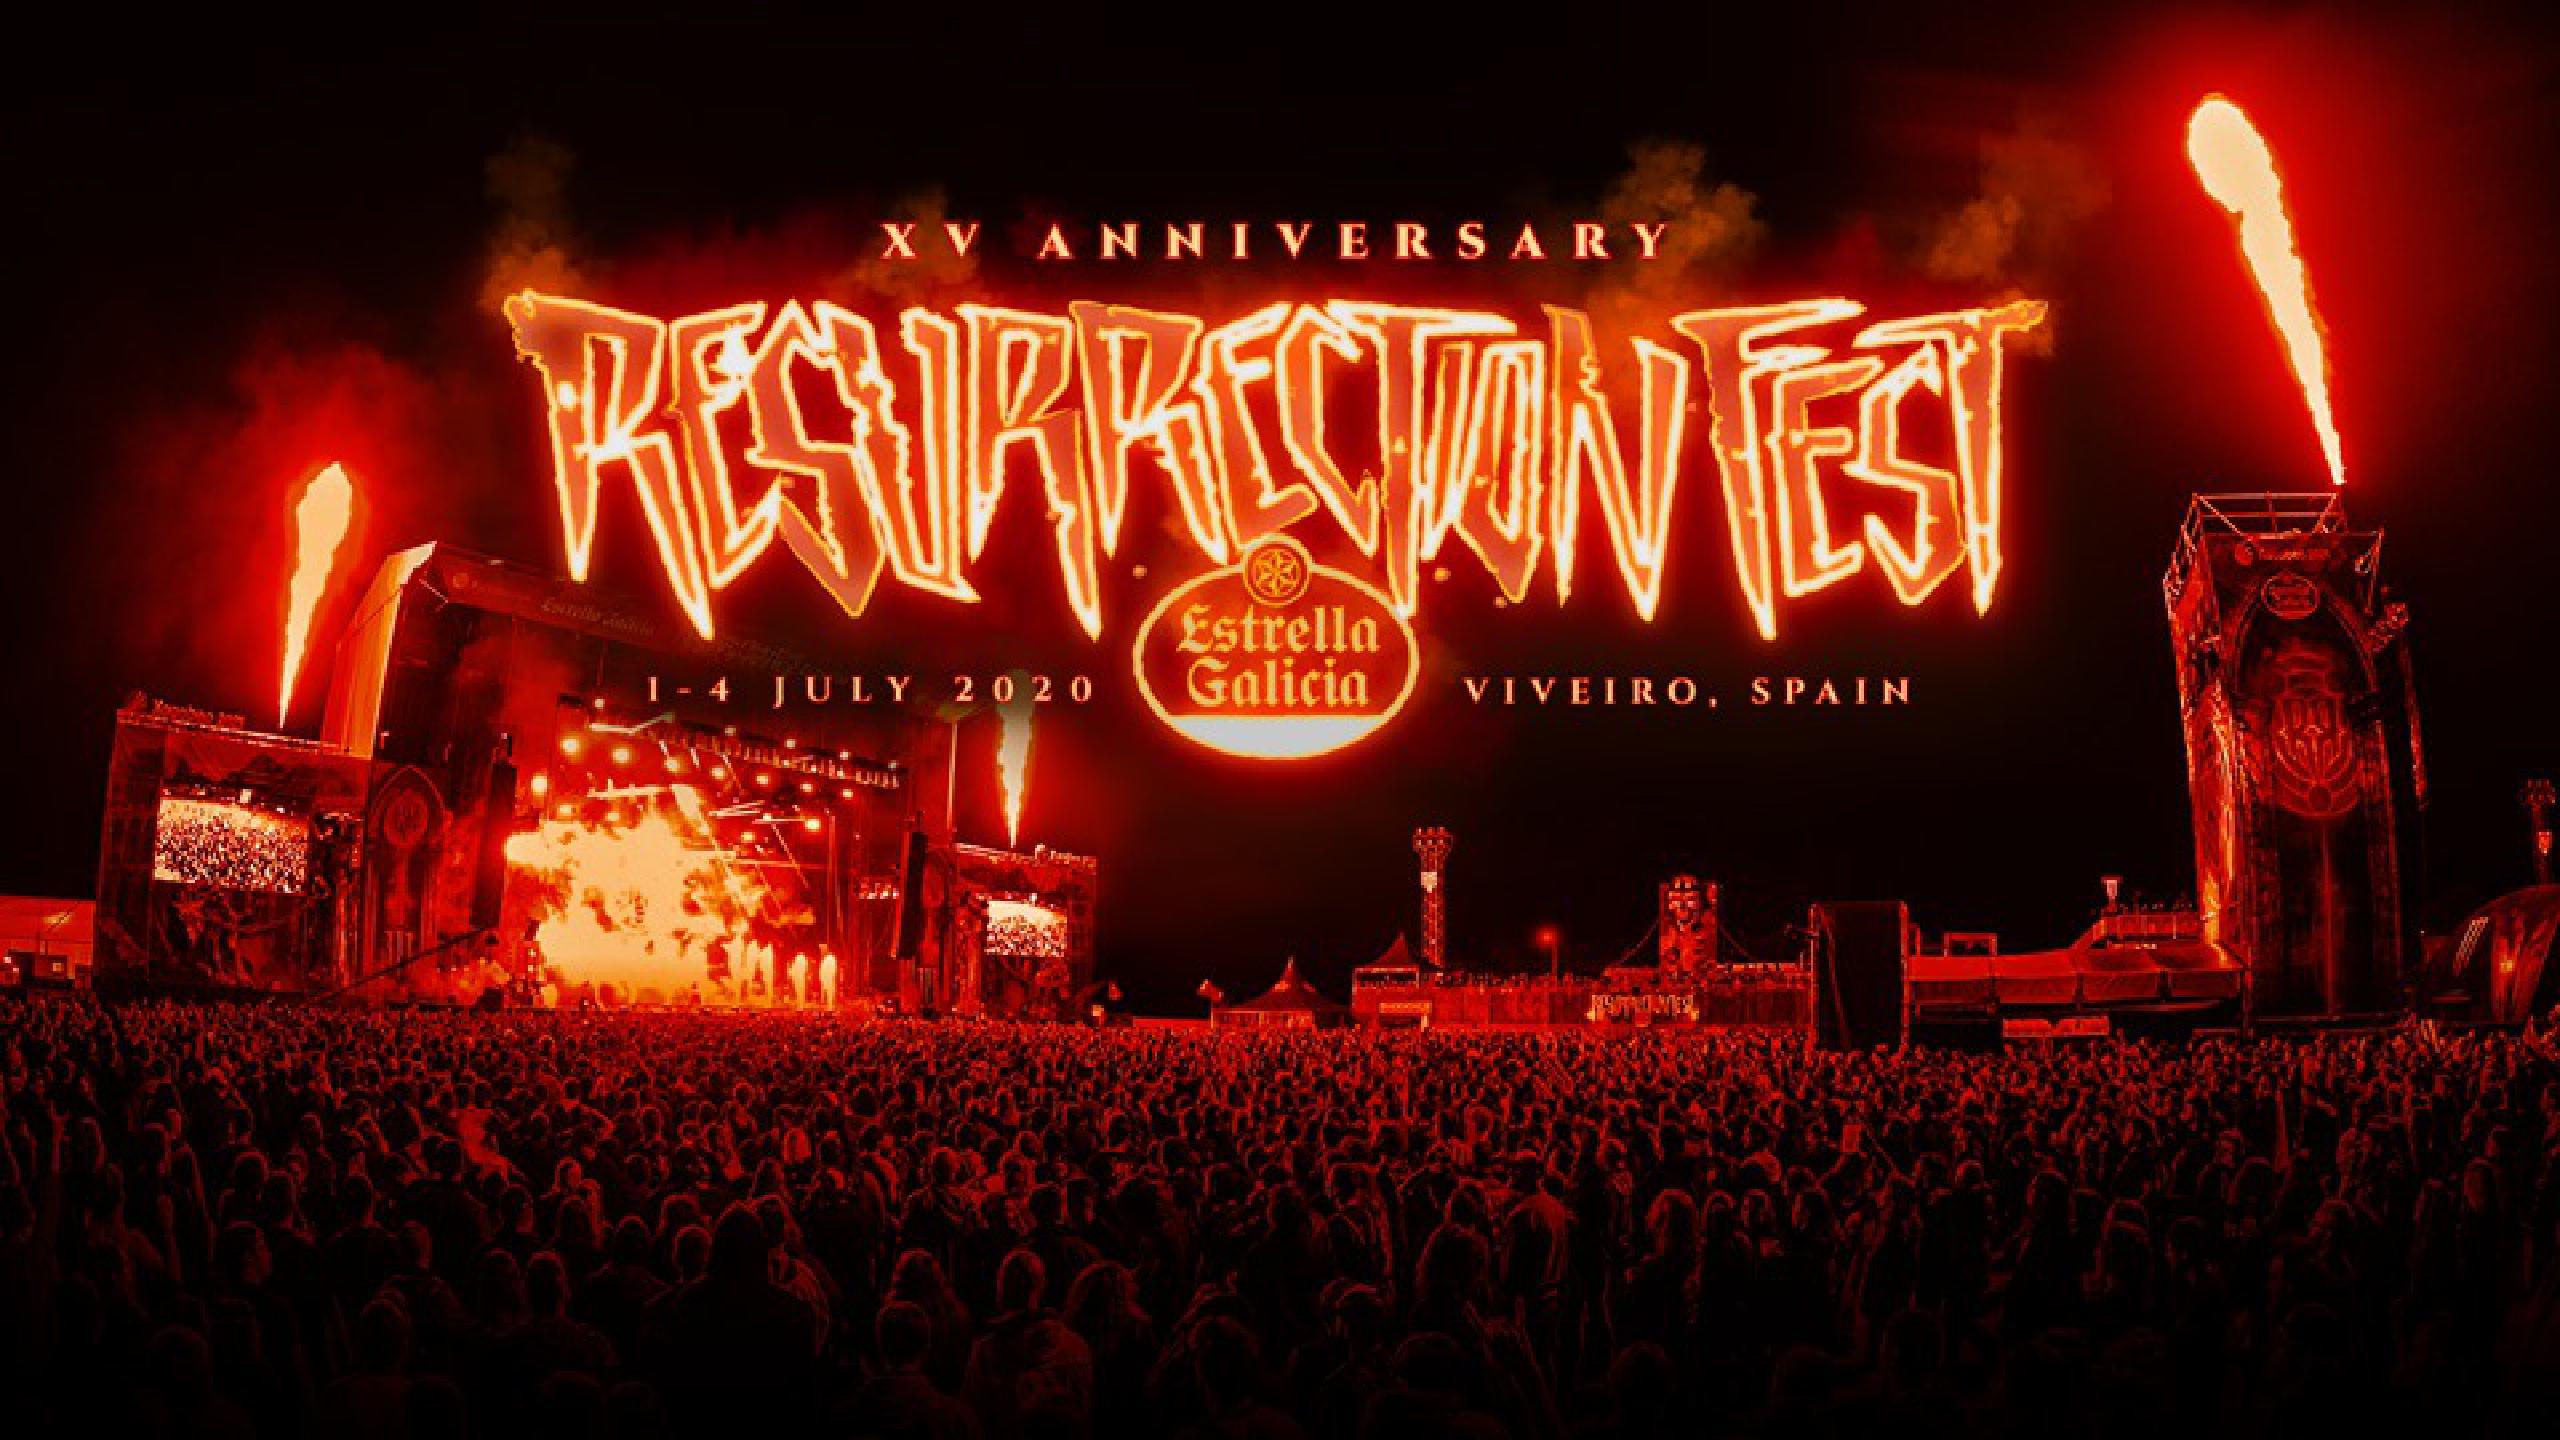 Festival Of Lights Riverside 2020.Resurrection Fest 2020 Tickets Lineup Bands For